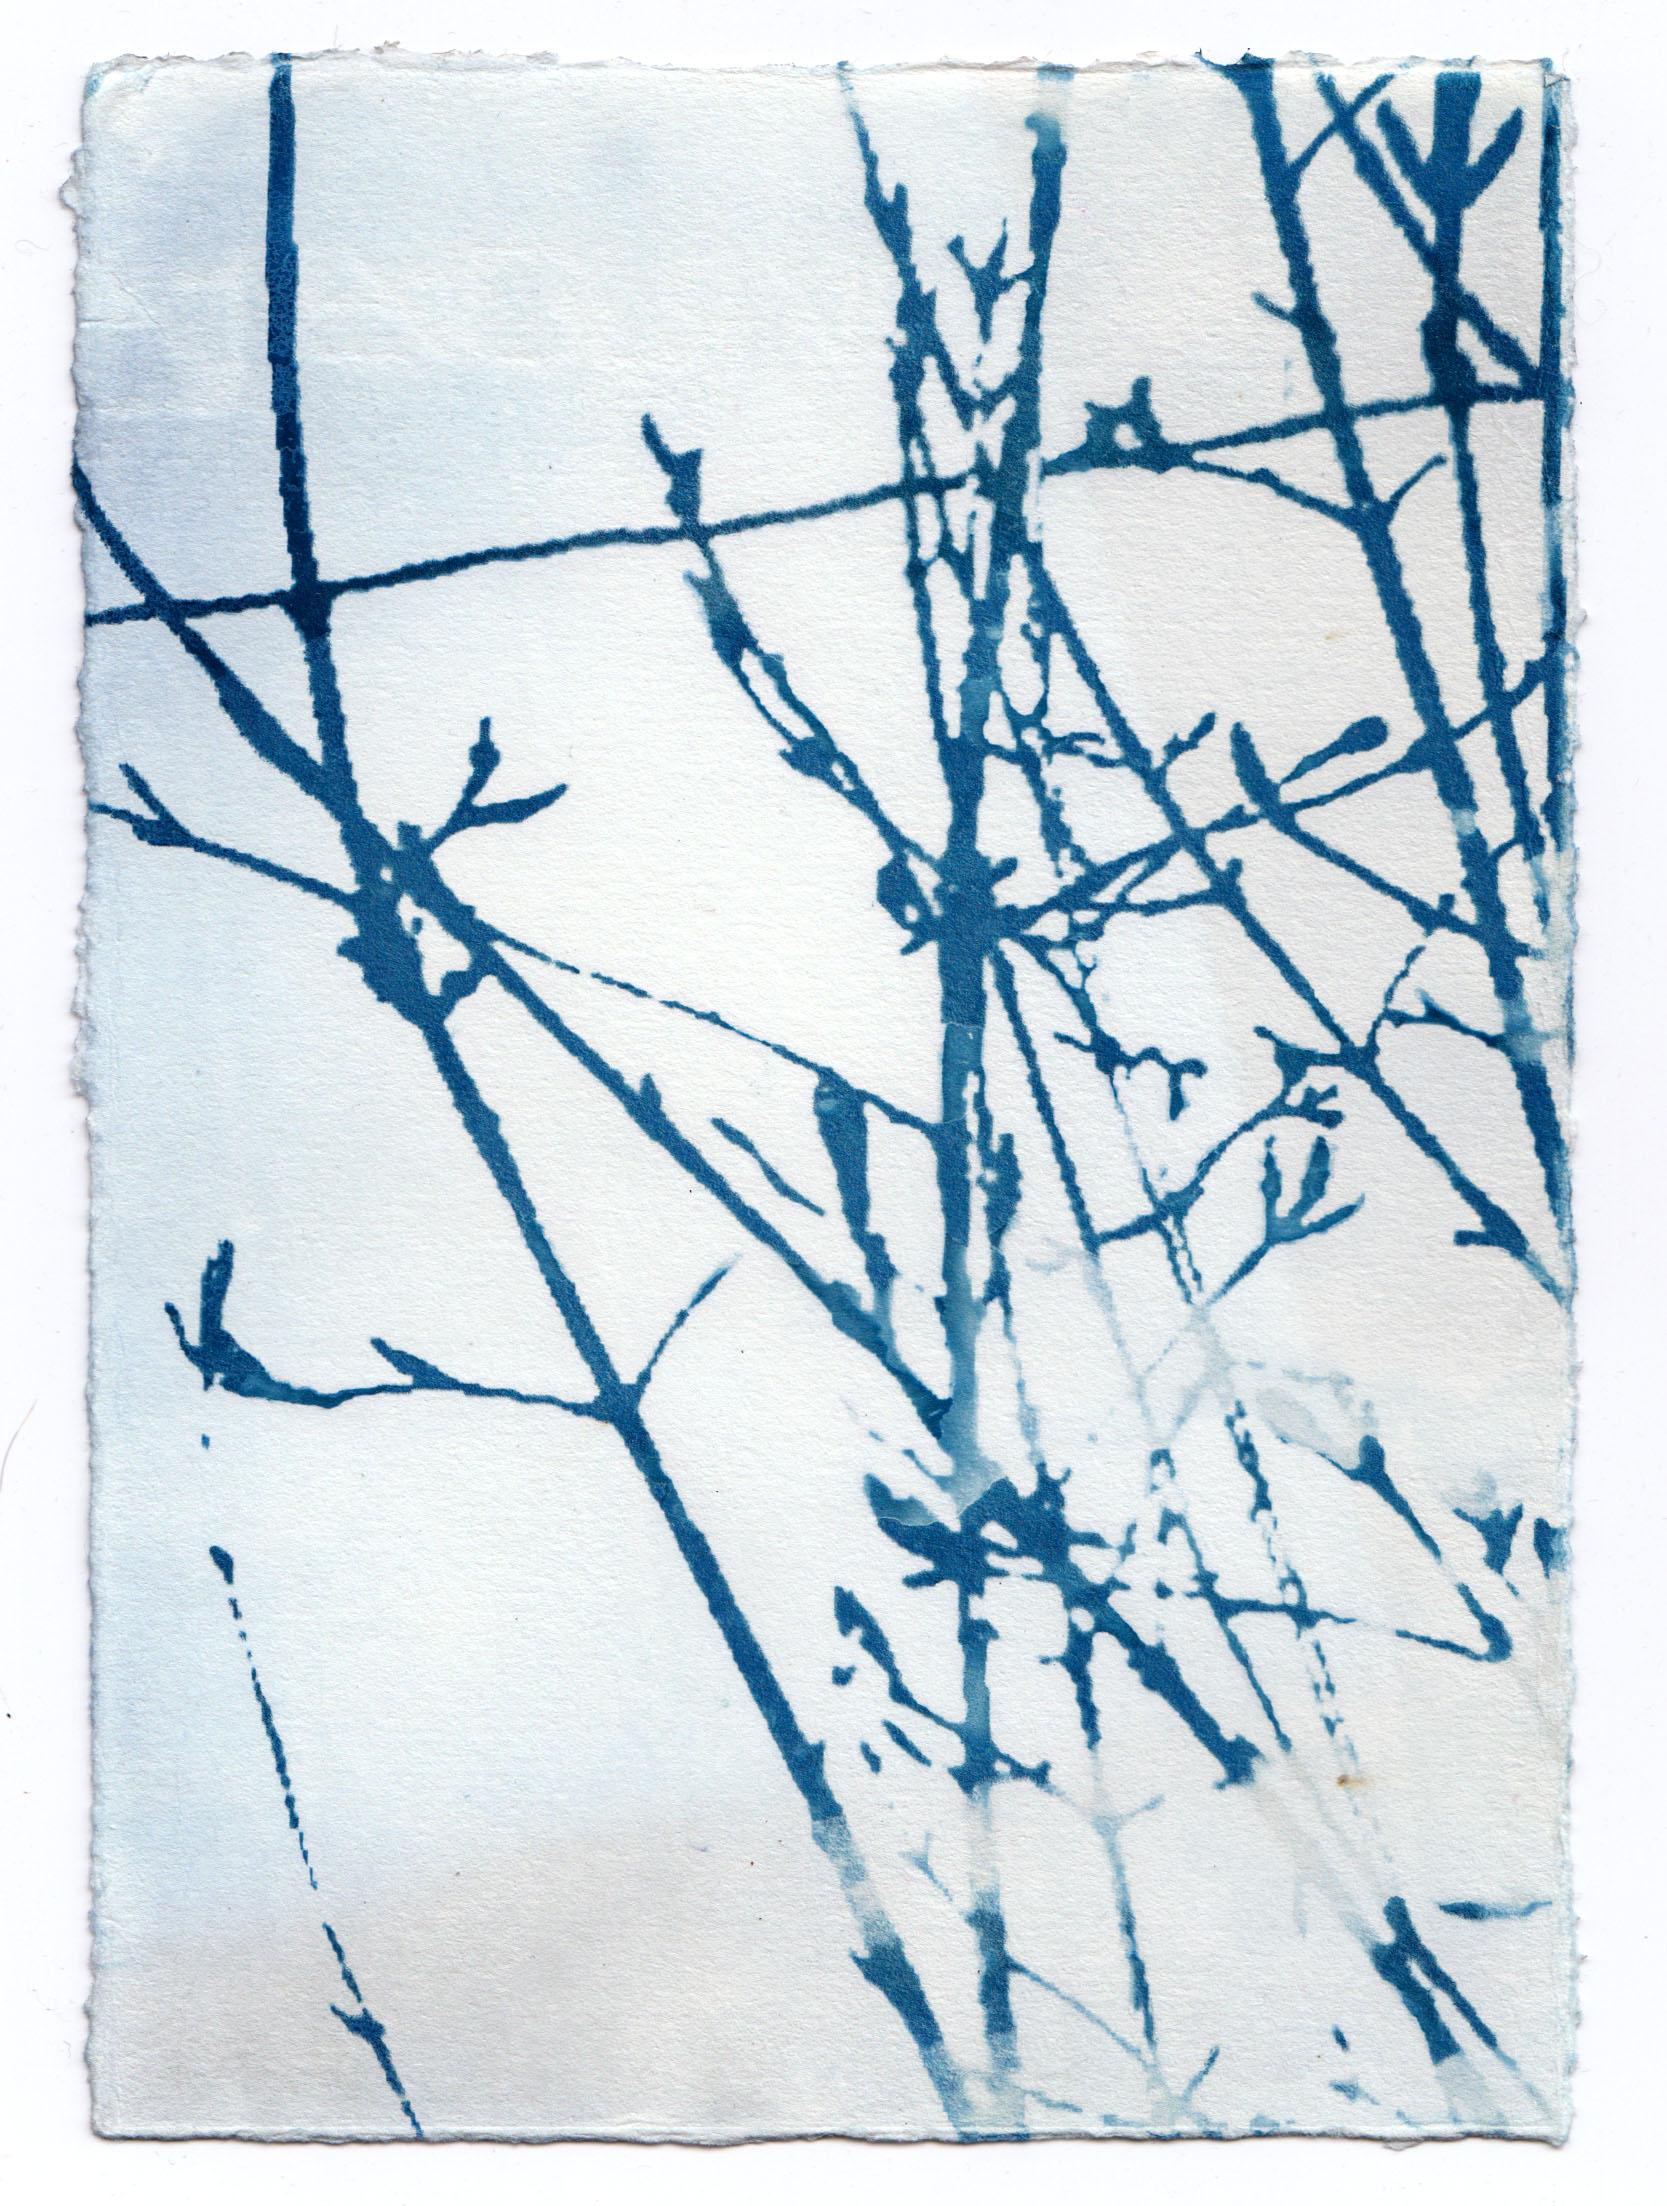 Blue Traces